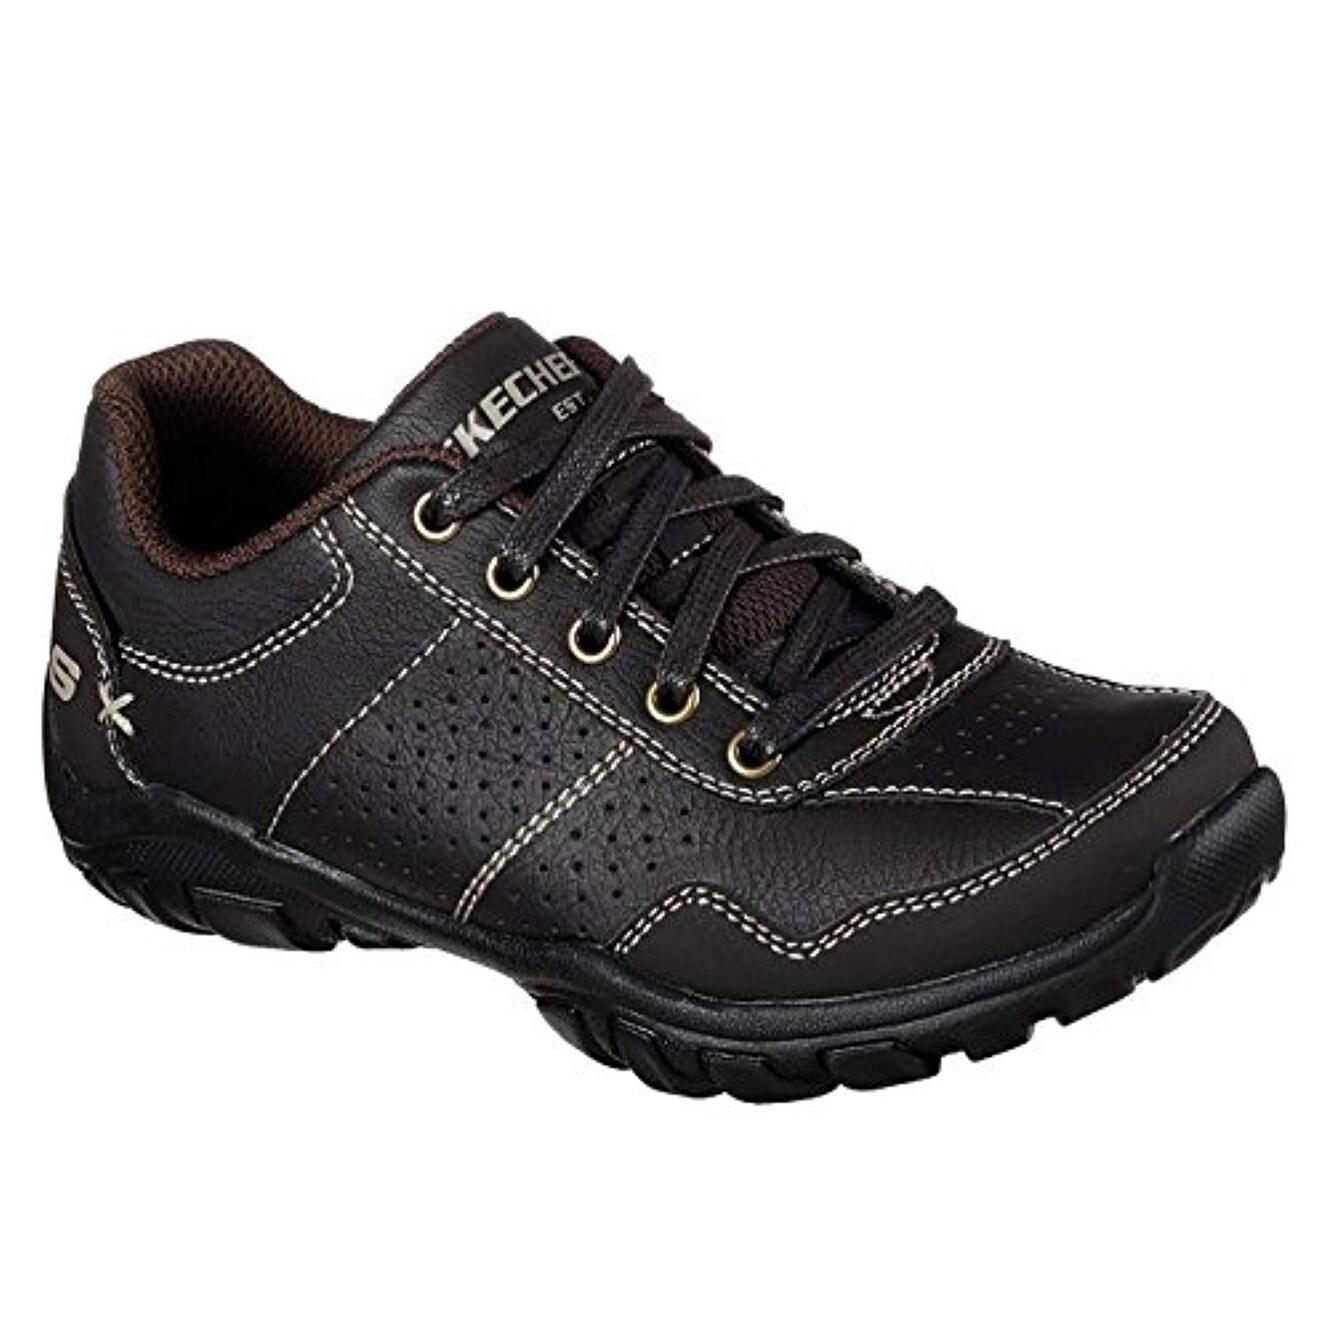 Skechers 96320L Boy's Relaxed Fit: Grambler Ii Sneakers, Chocolate 12